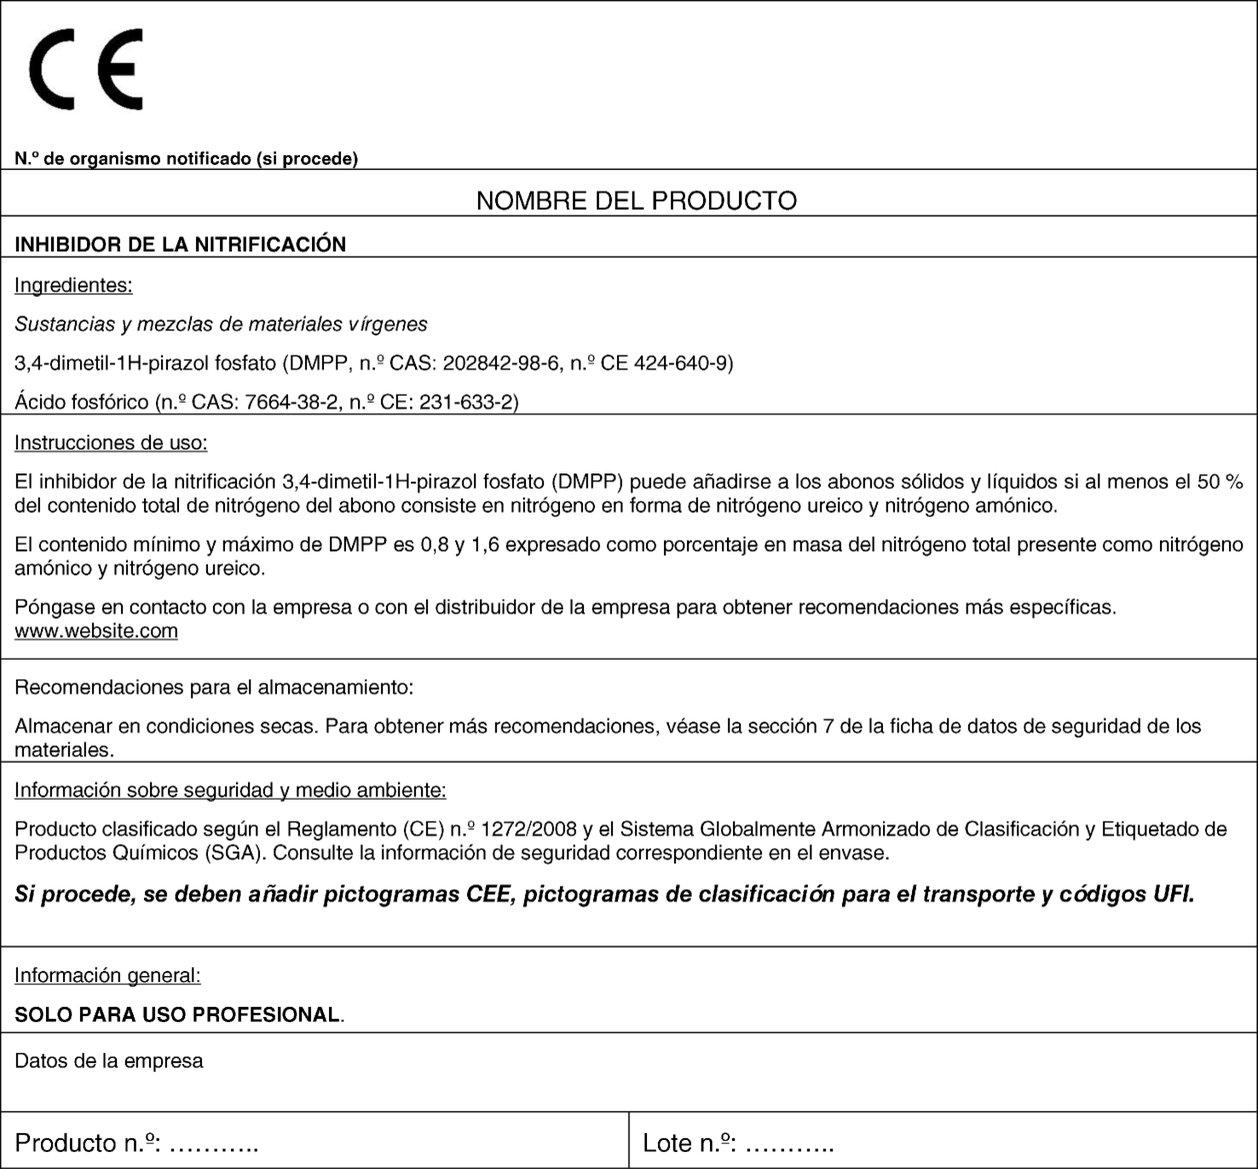 Imagen: http://publications.europa.eu/resource/uriserv/OJ.C_.2021.119.01.0001.01.SPA.xhtml.C_2021119ES.01003201.tif.jpg